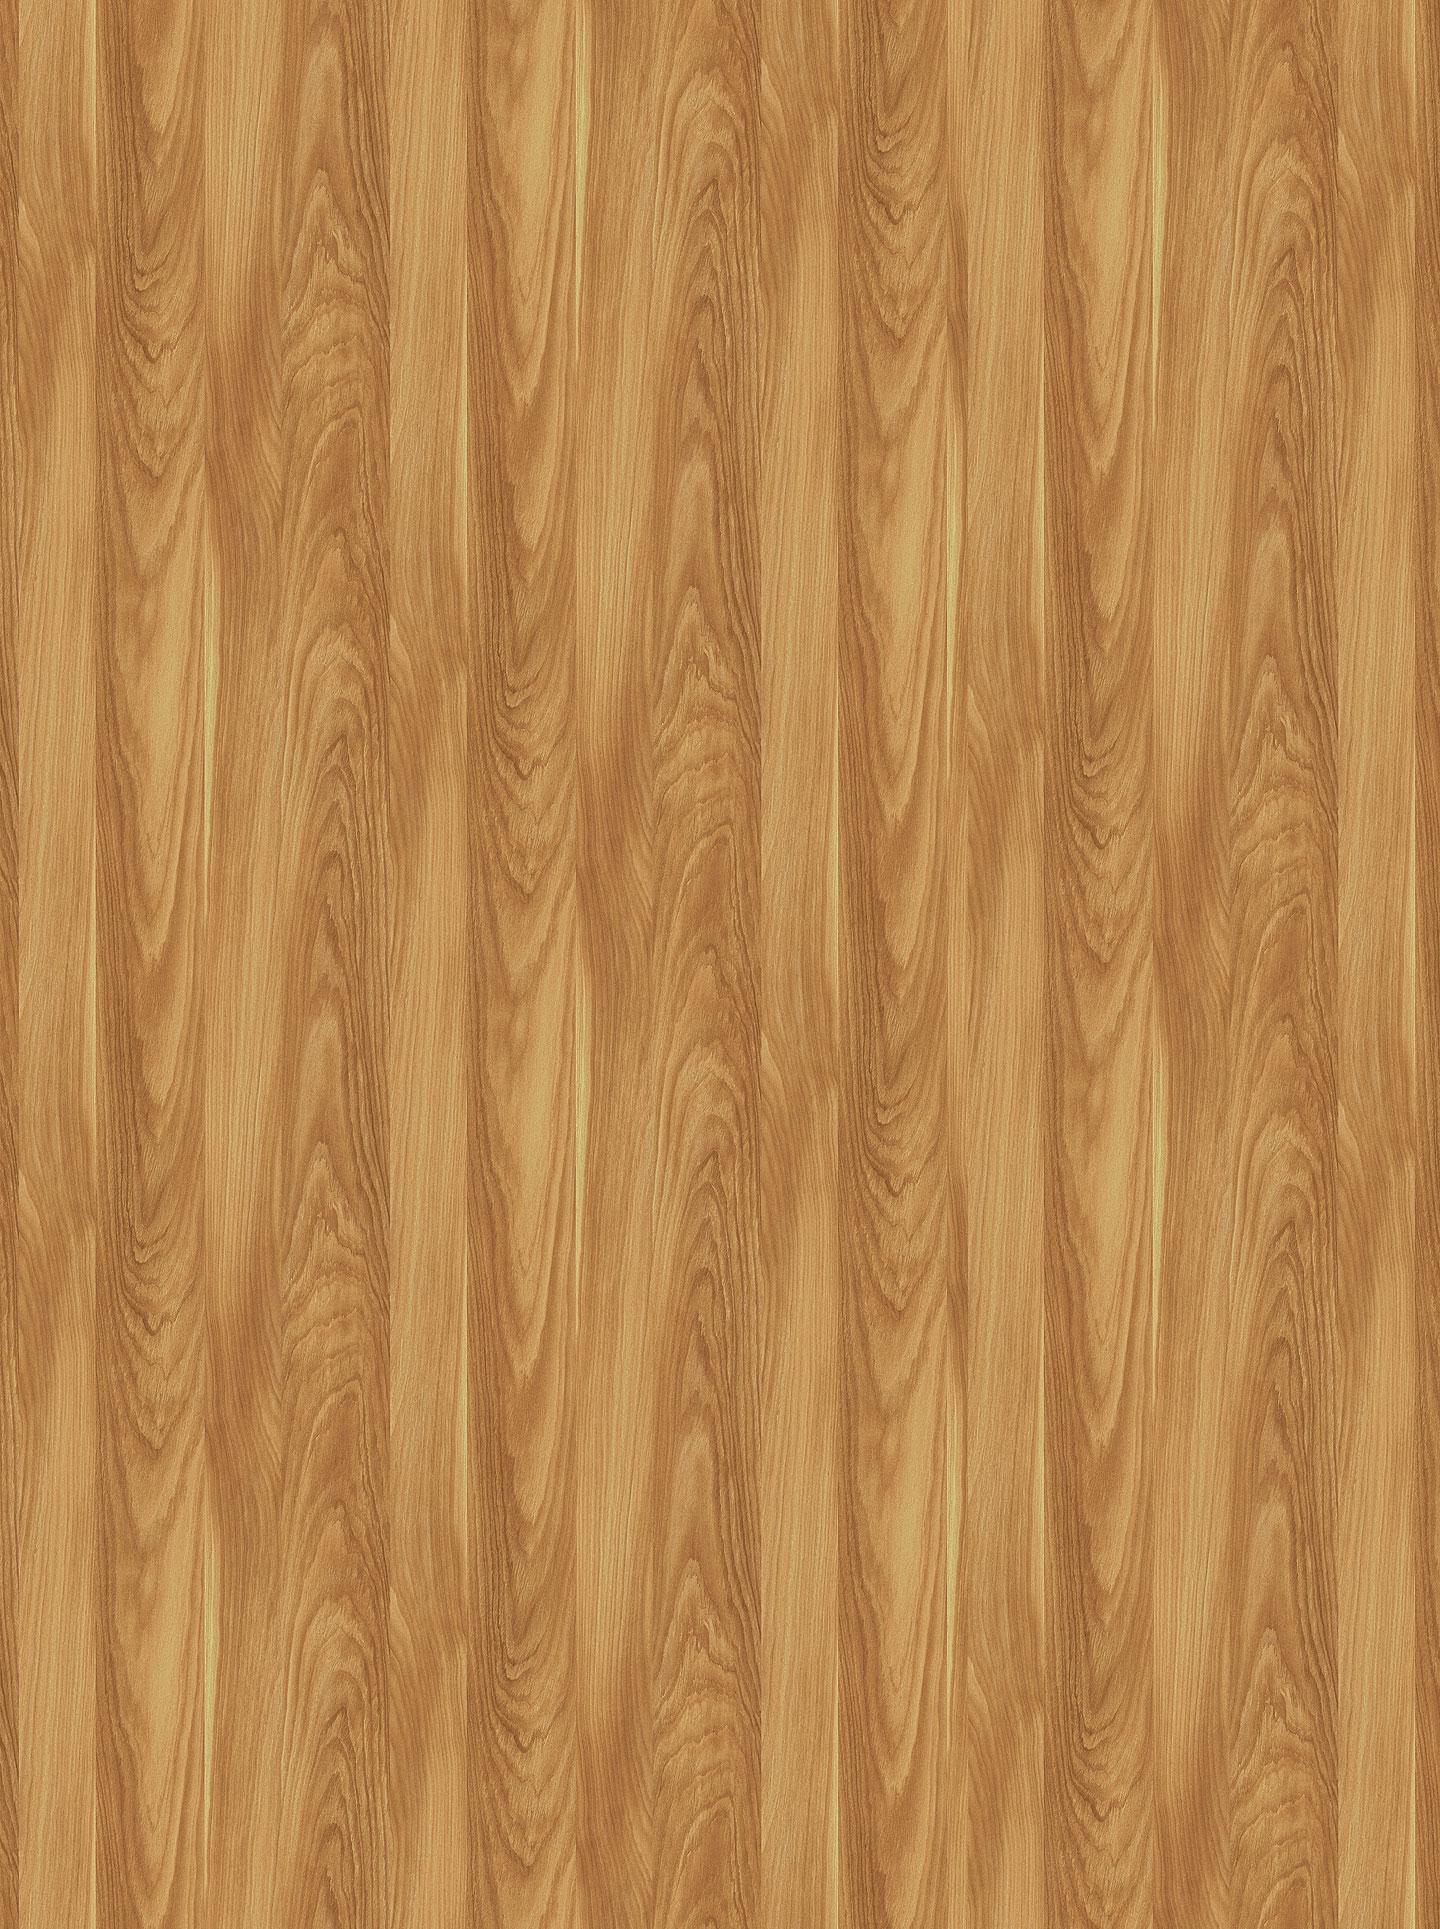 Terra Walnut Golden Blonde